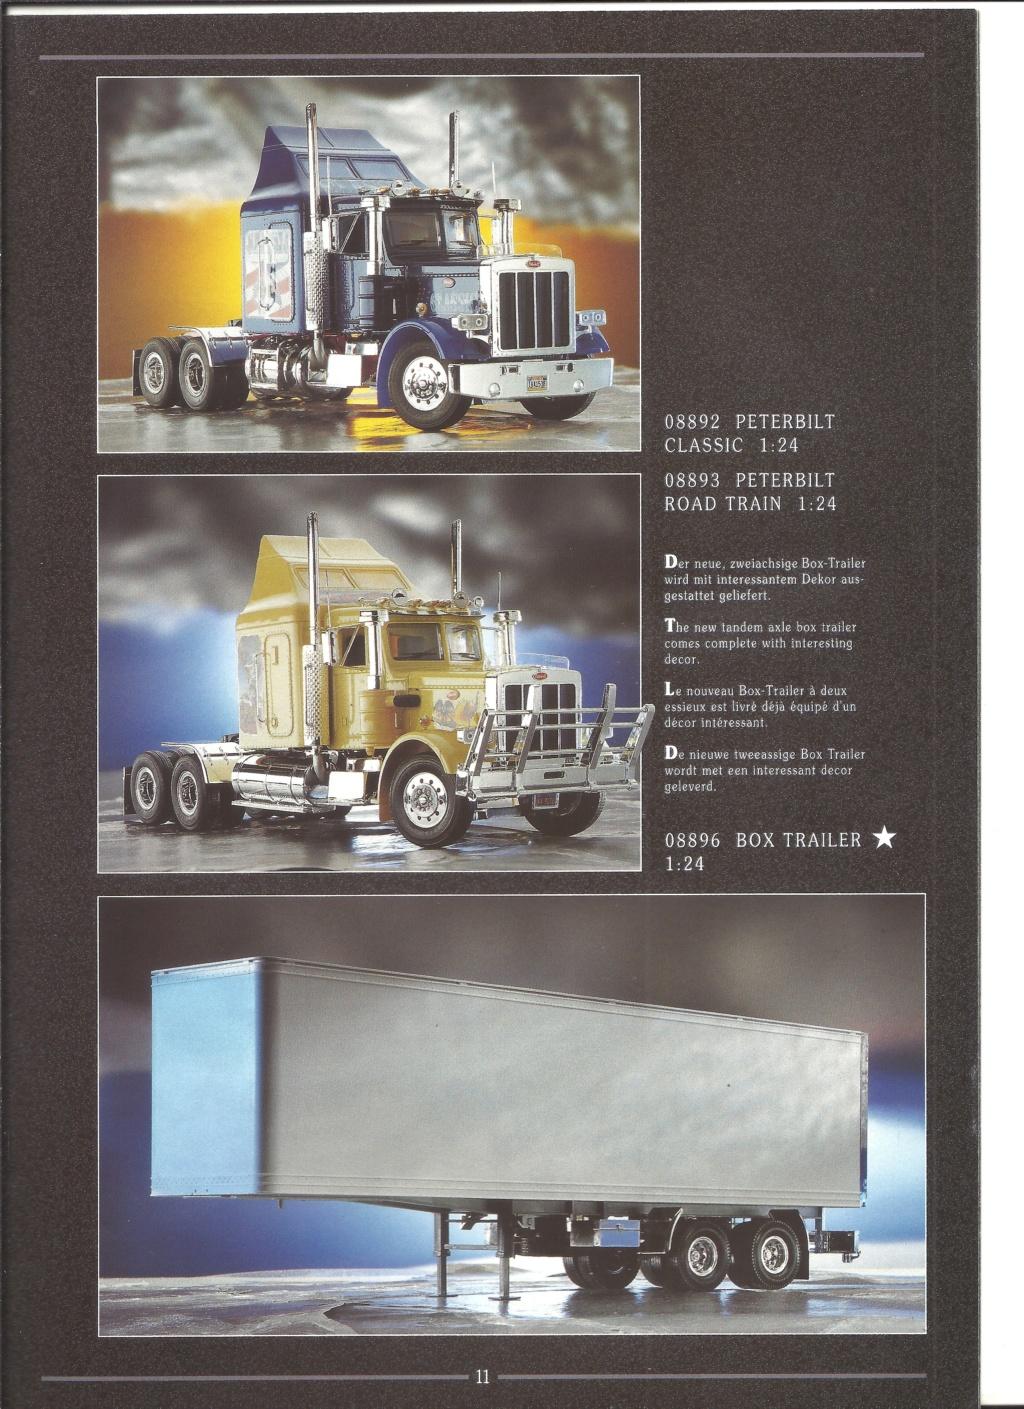 [REVELL 1995] Catalogue METAL miniatures 1995  Revell41